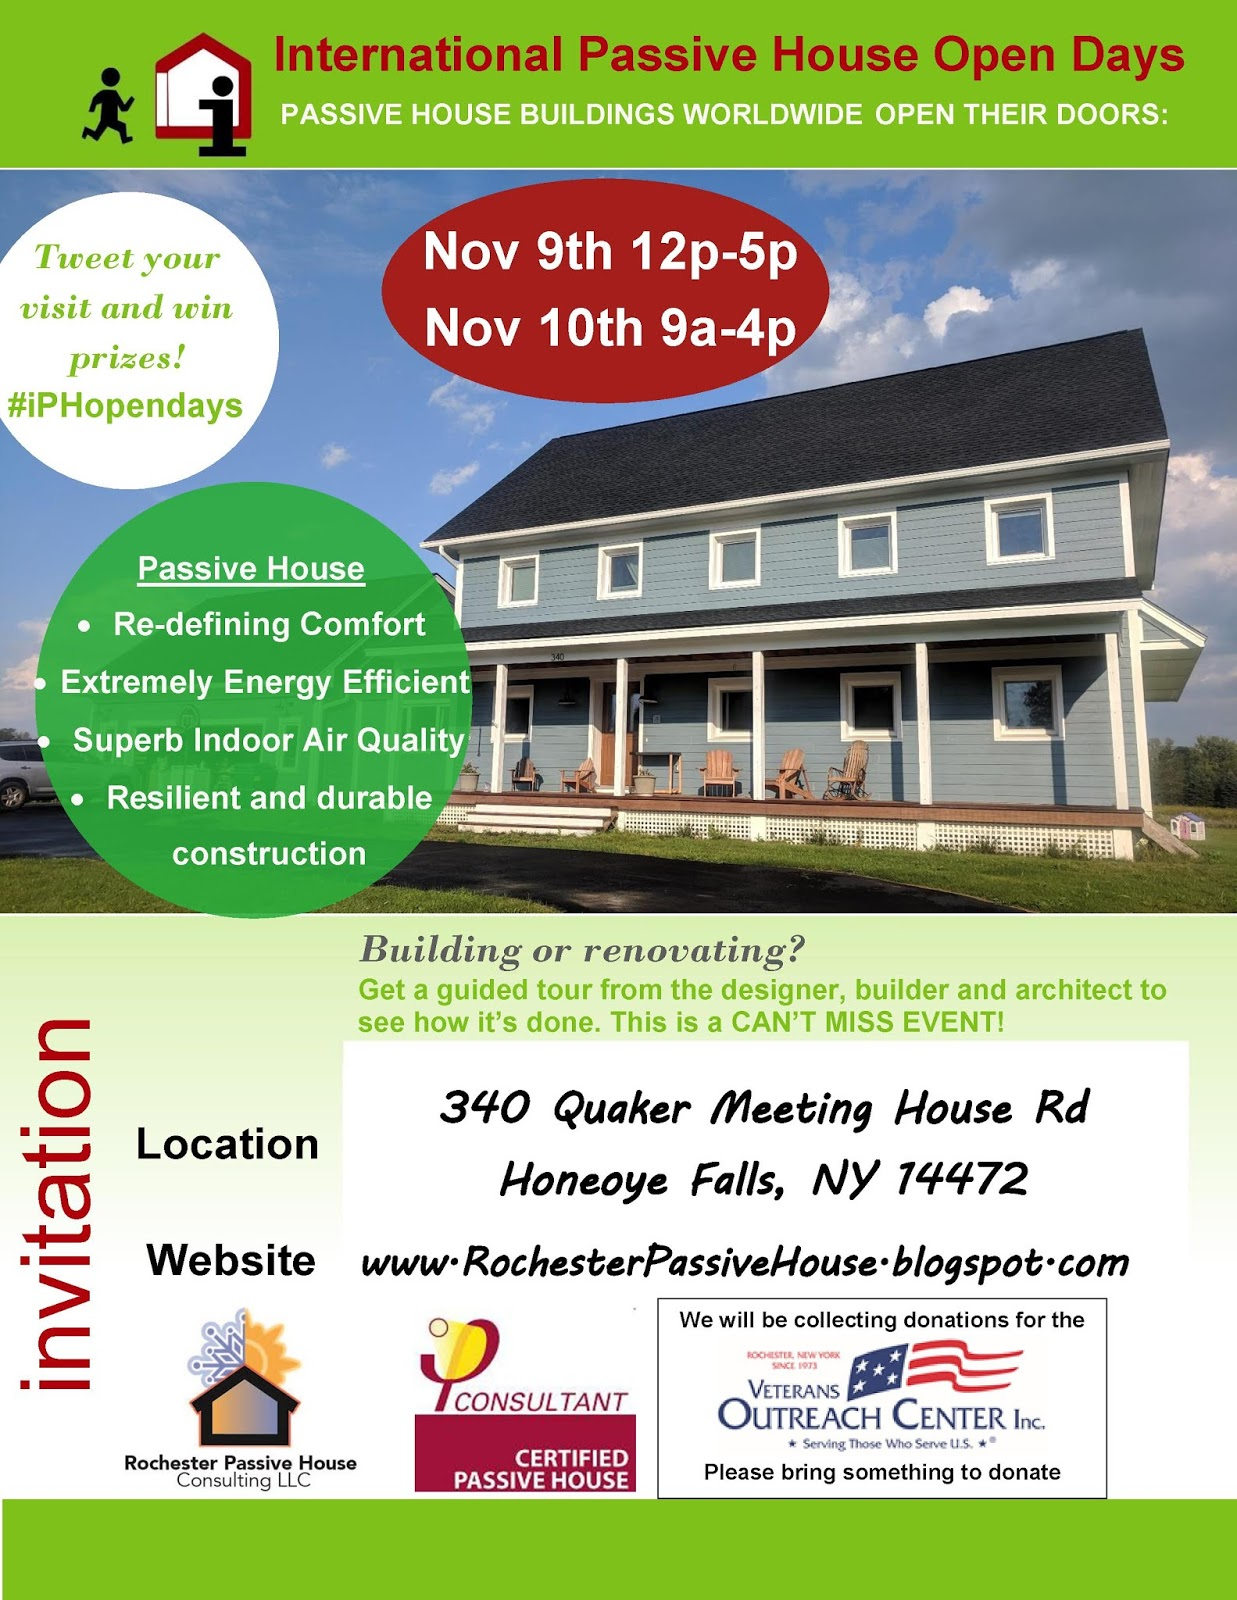 Rochester Passive House